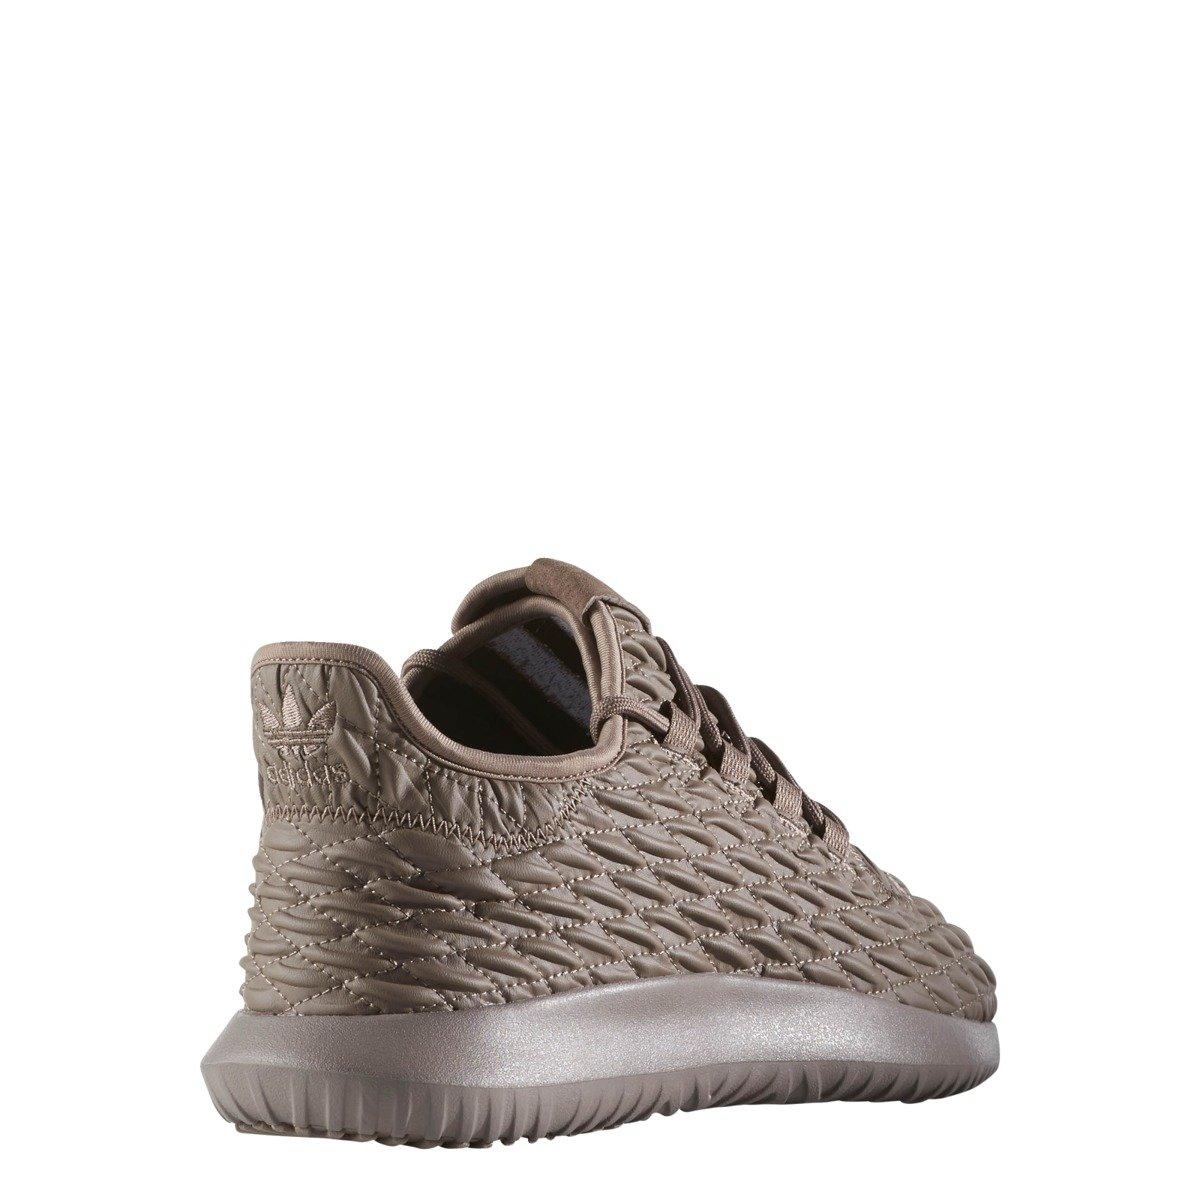 Tubular Schuhe Adidas Adidas Shadow Tubular BB8974 Shadow nP0wk8OX